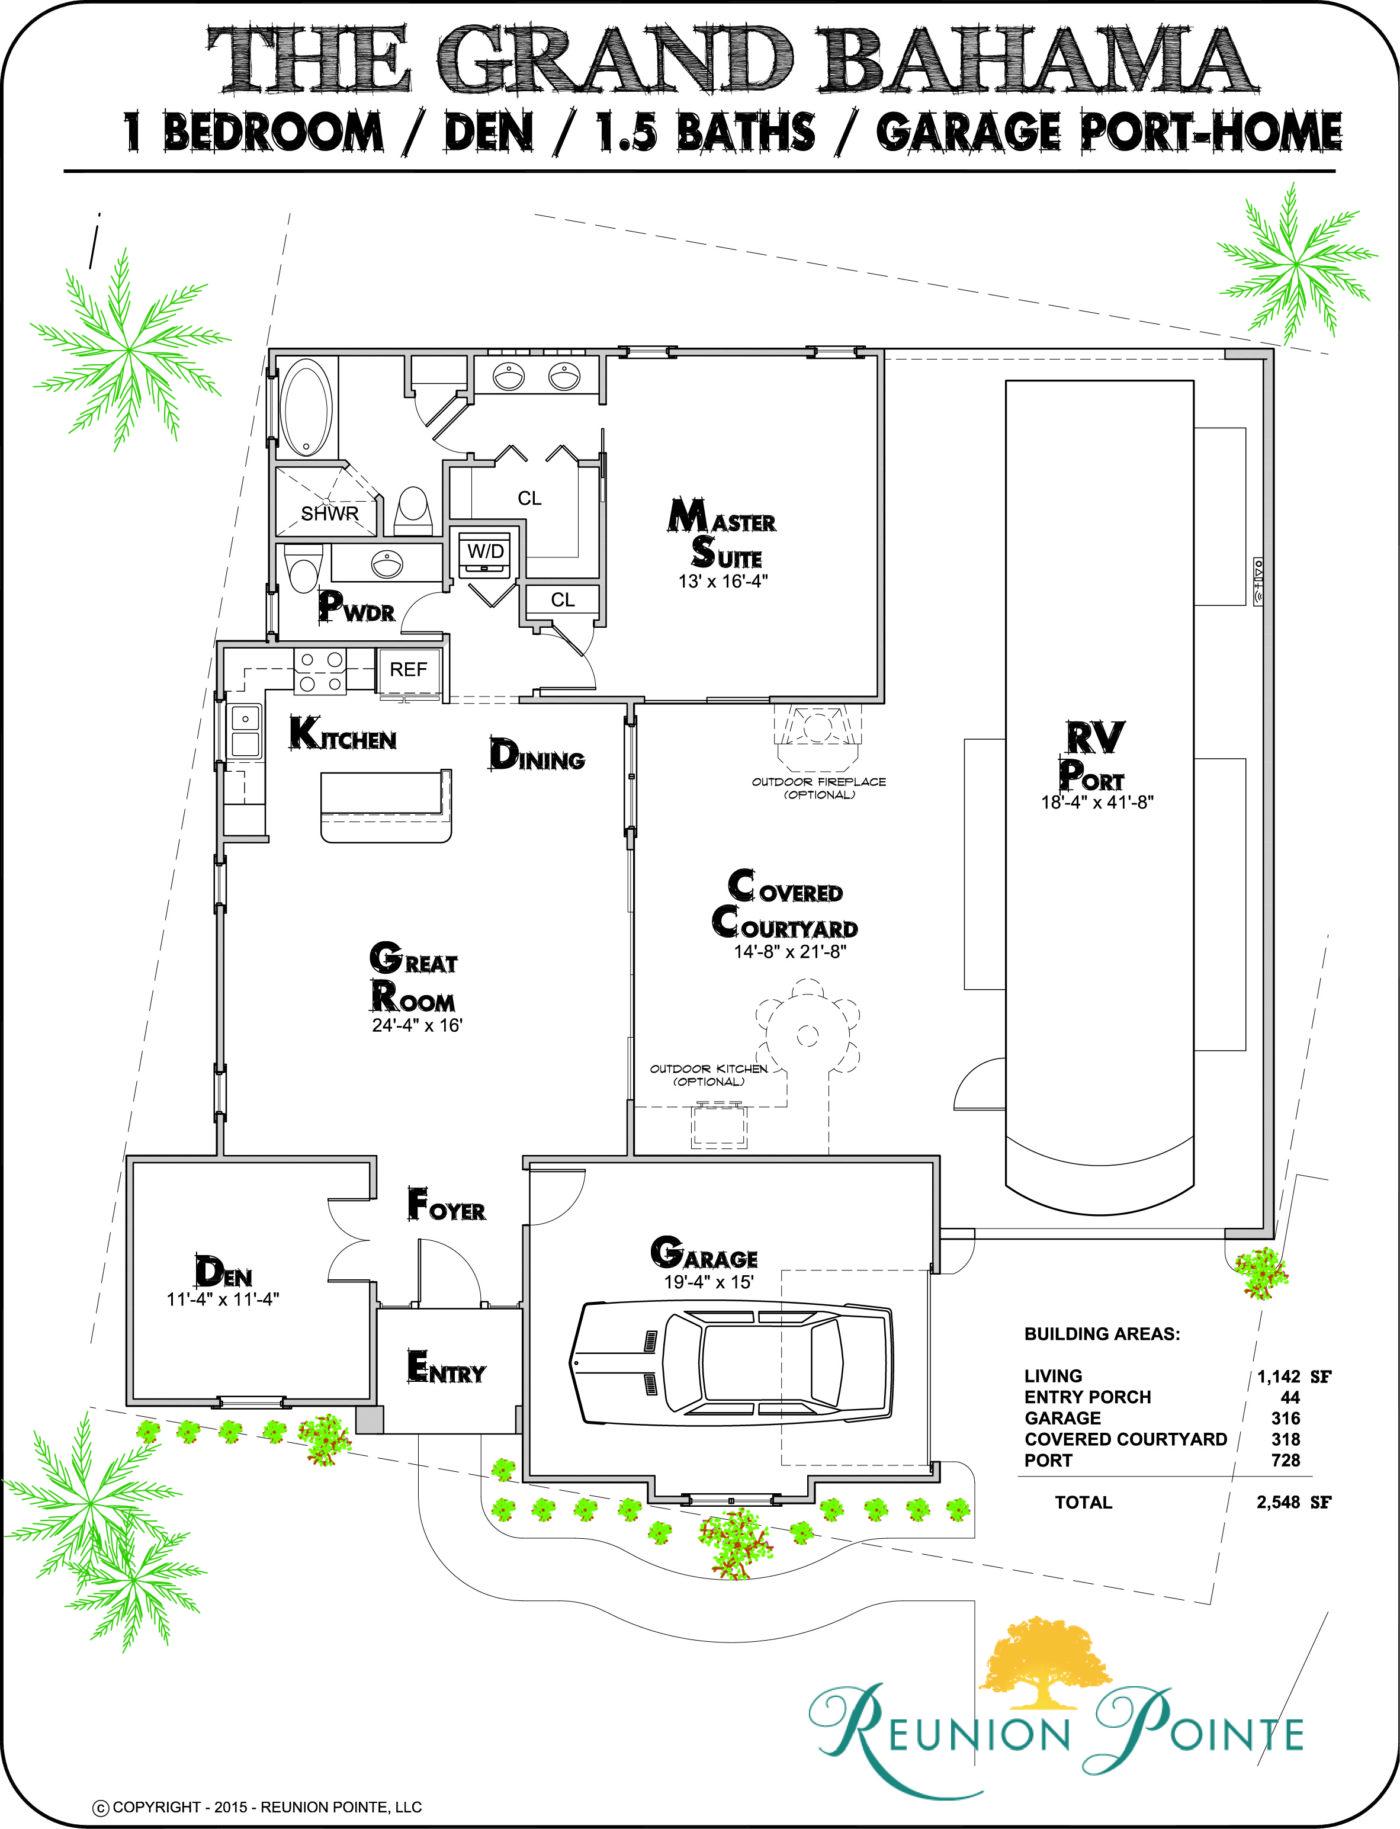 Test Drive Your New RV Port-Home | Reunion Pointe on lighting plans, basement plans, room plans, framing plans, garage plans, construction plans, ceiling plans, deck plans, foundation plans, roof plans, apartment plans, garden plans, houseboat plans,